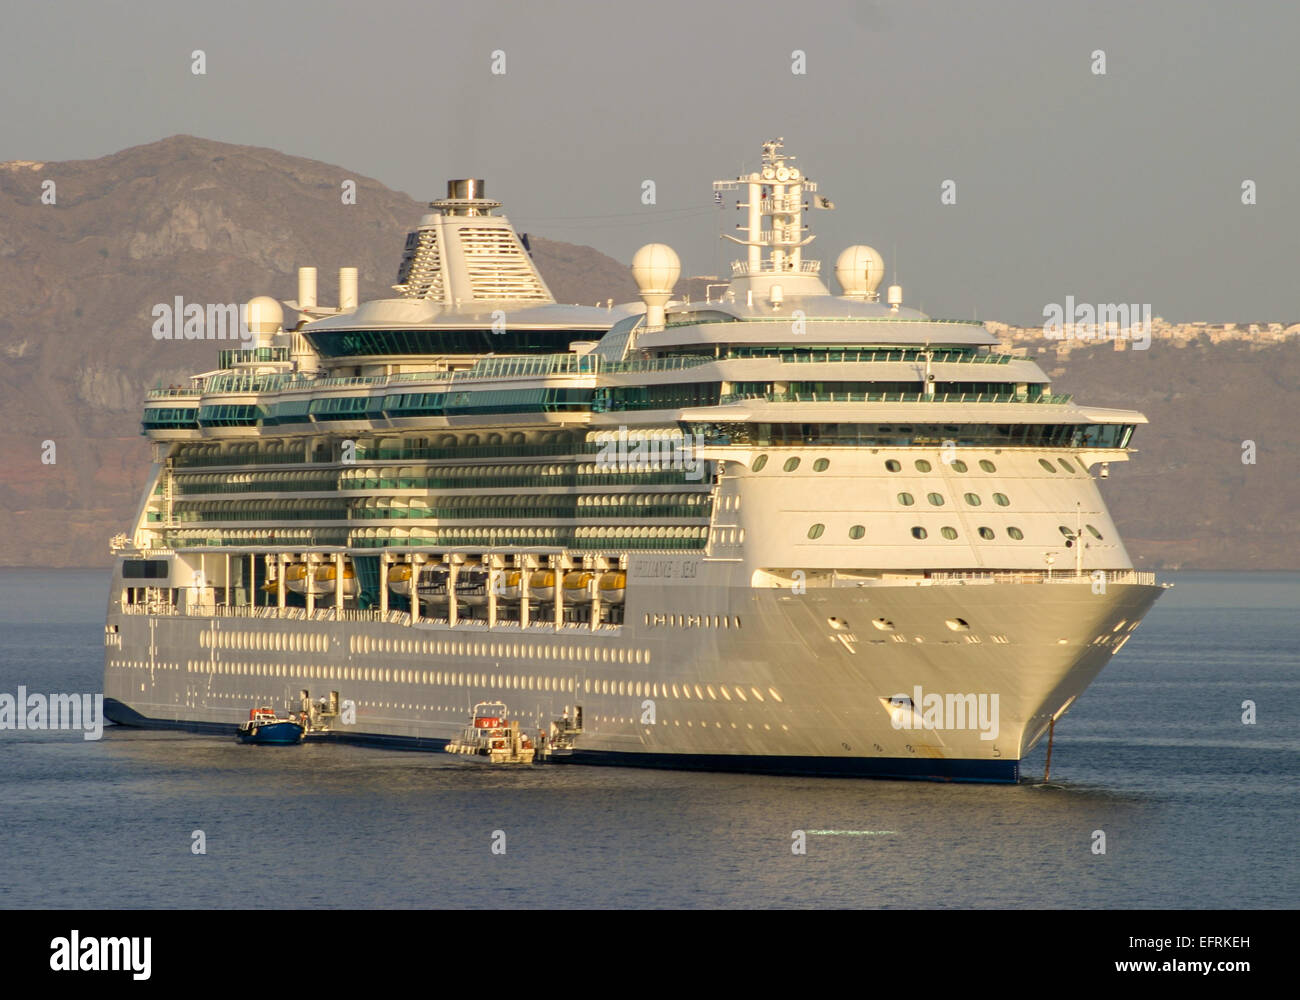 Brilliance Of The Seas Royal Caribbean Imágenes De Stock ... 6a19199d9428